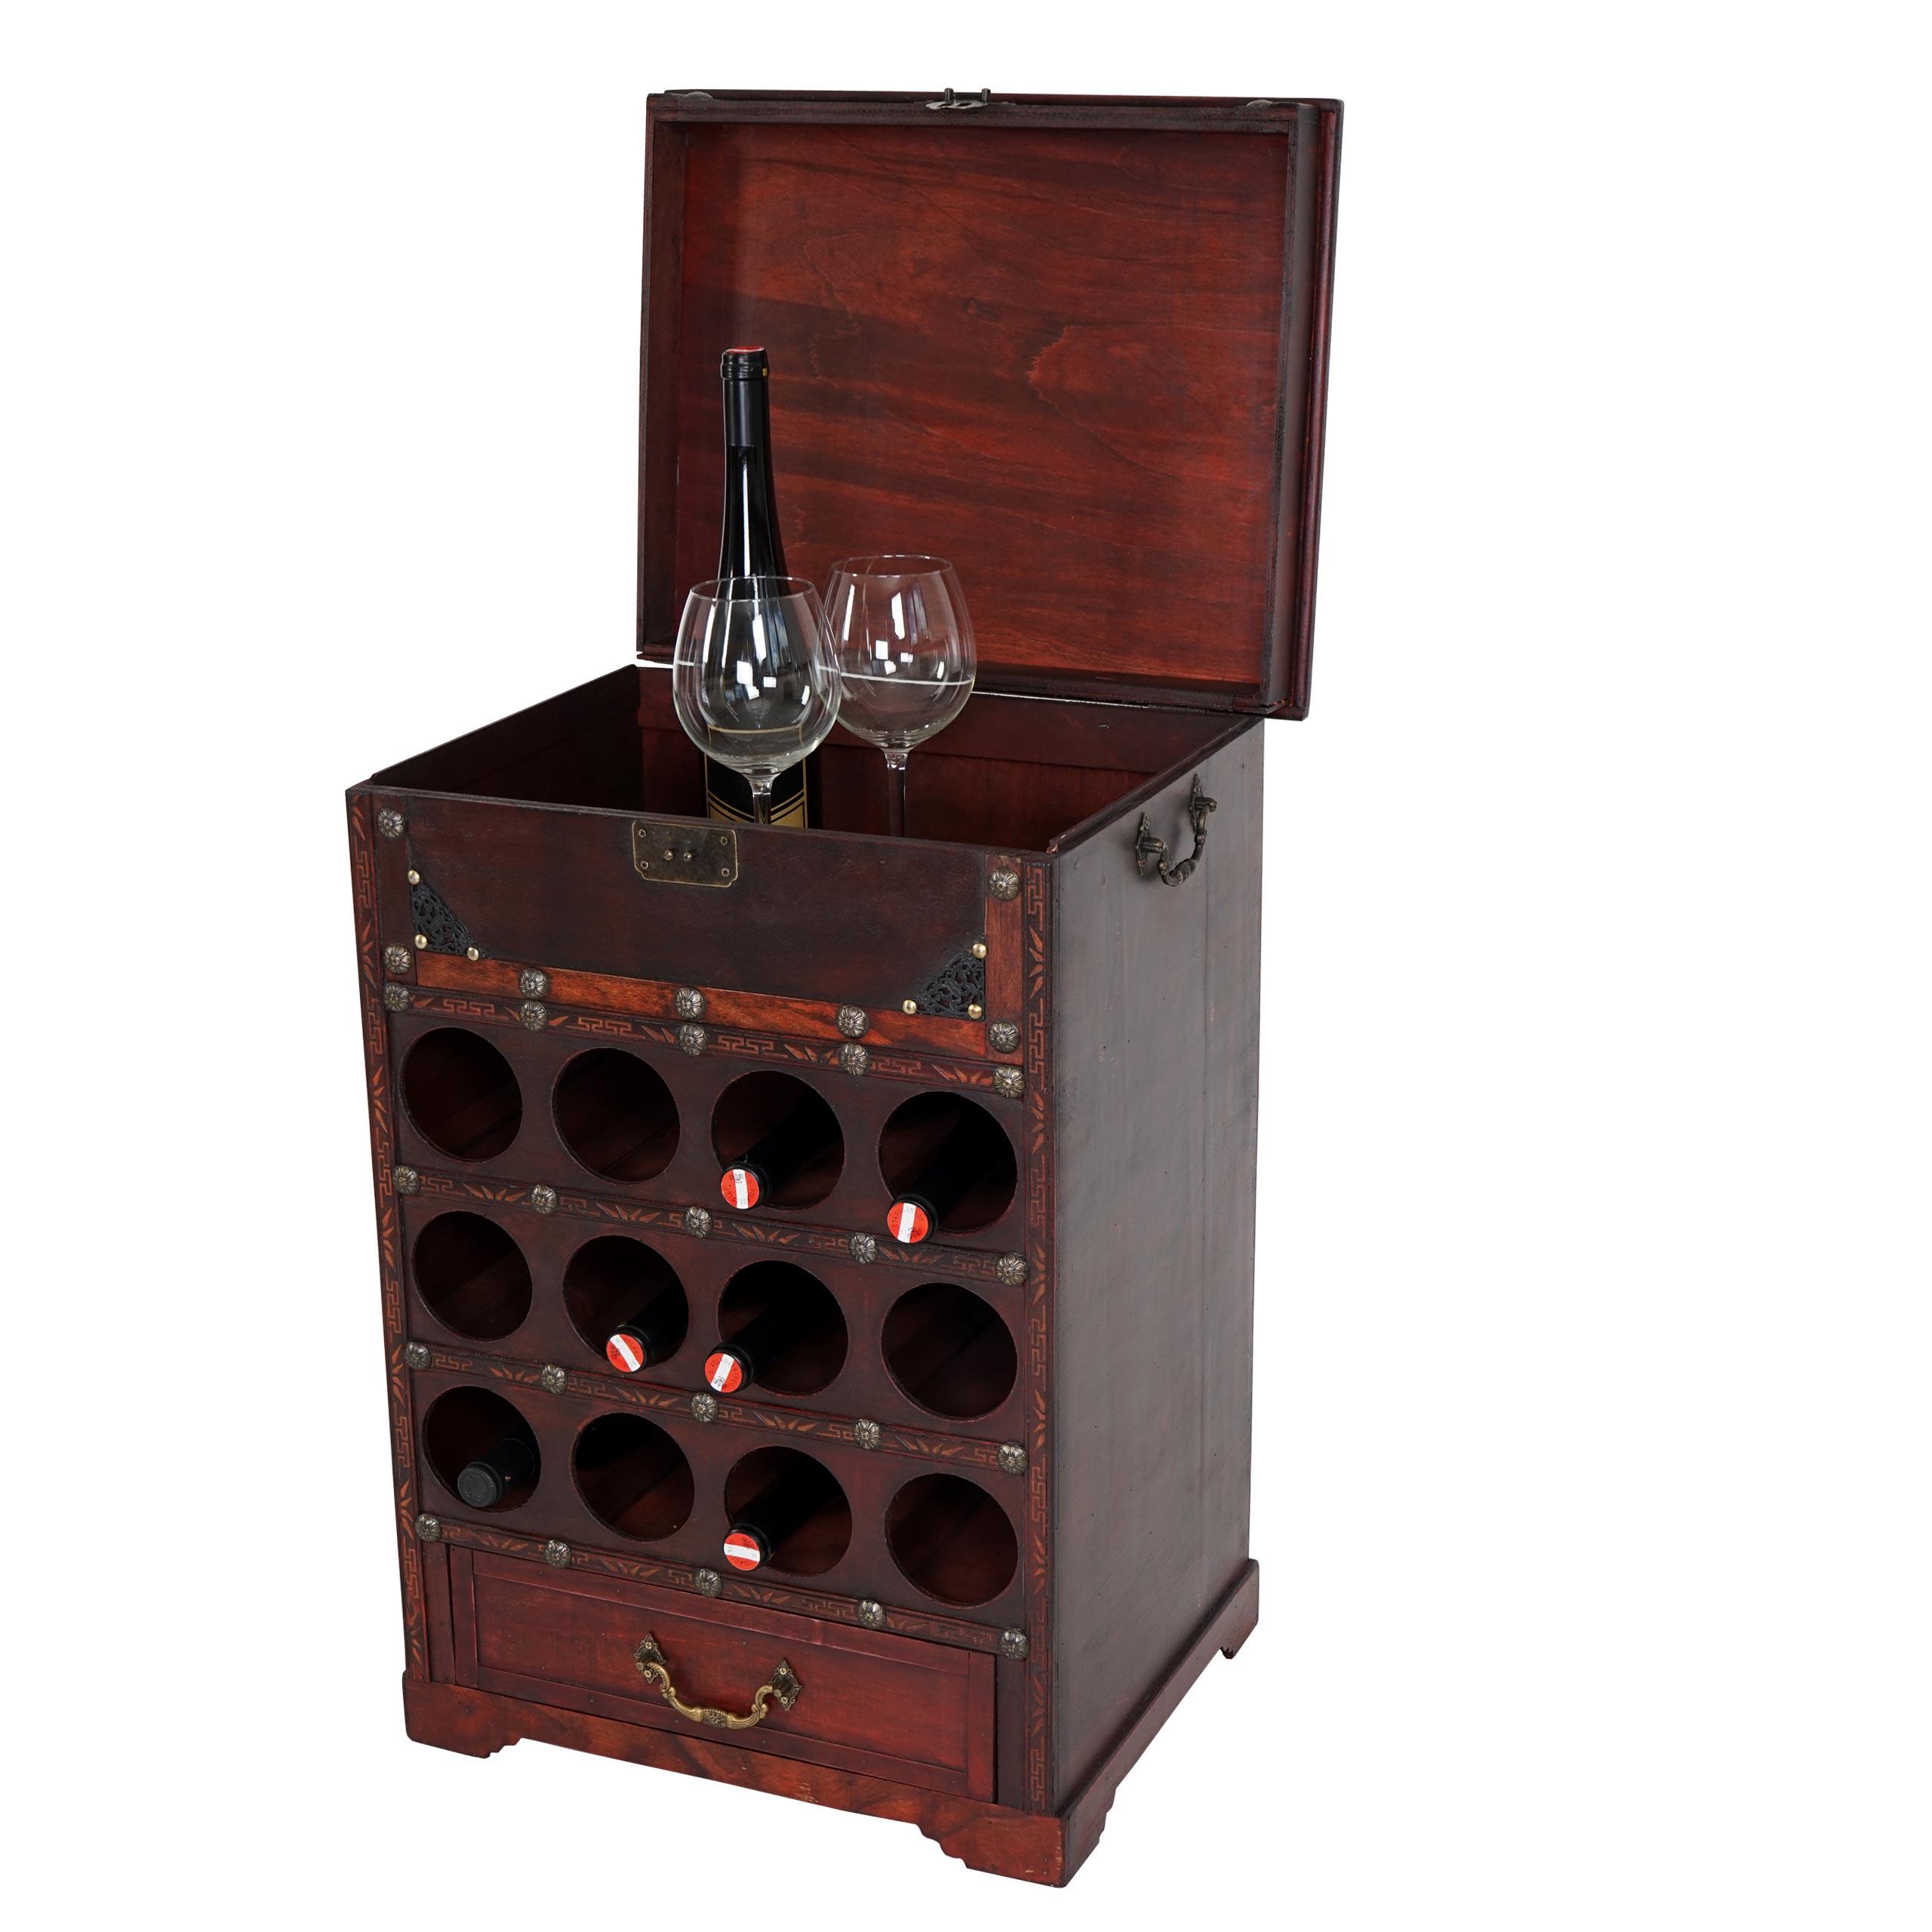 Mendler Weinregal Calvados T254, Flaschenregal Regal Holzregal, für 12 Flaschen Kolonialstil 69x47x38 cm ~ V 36637